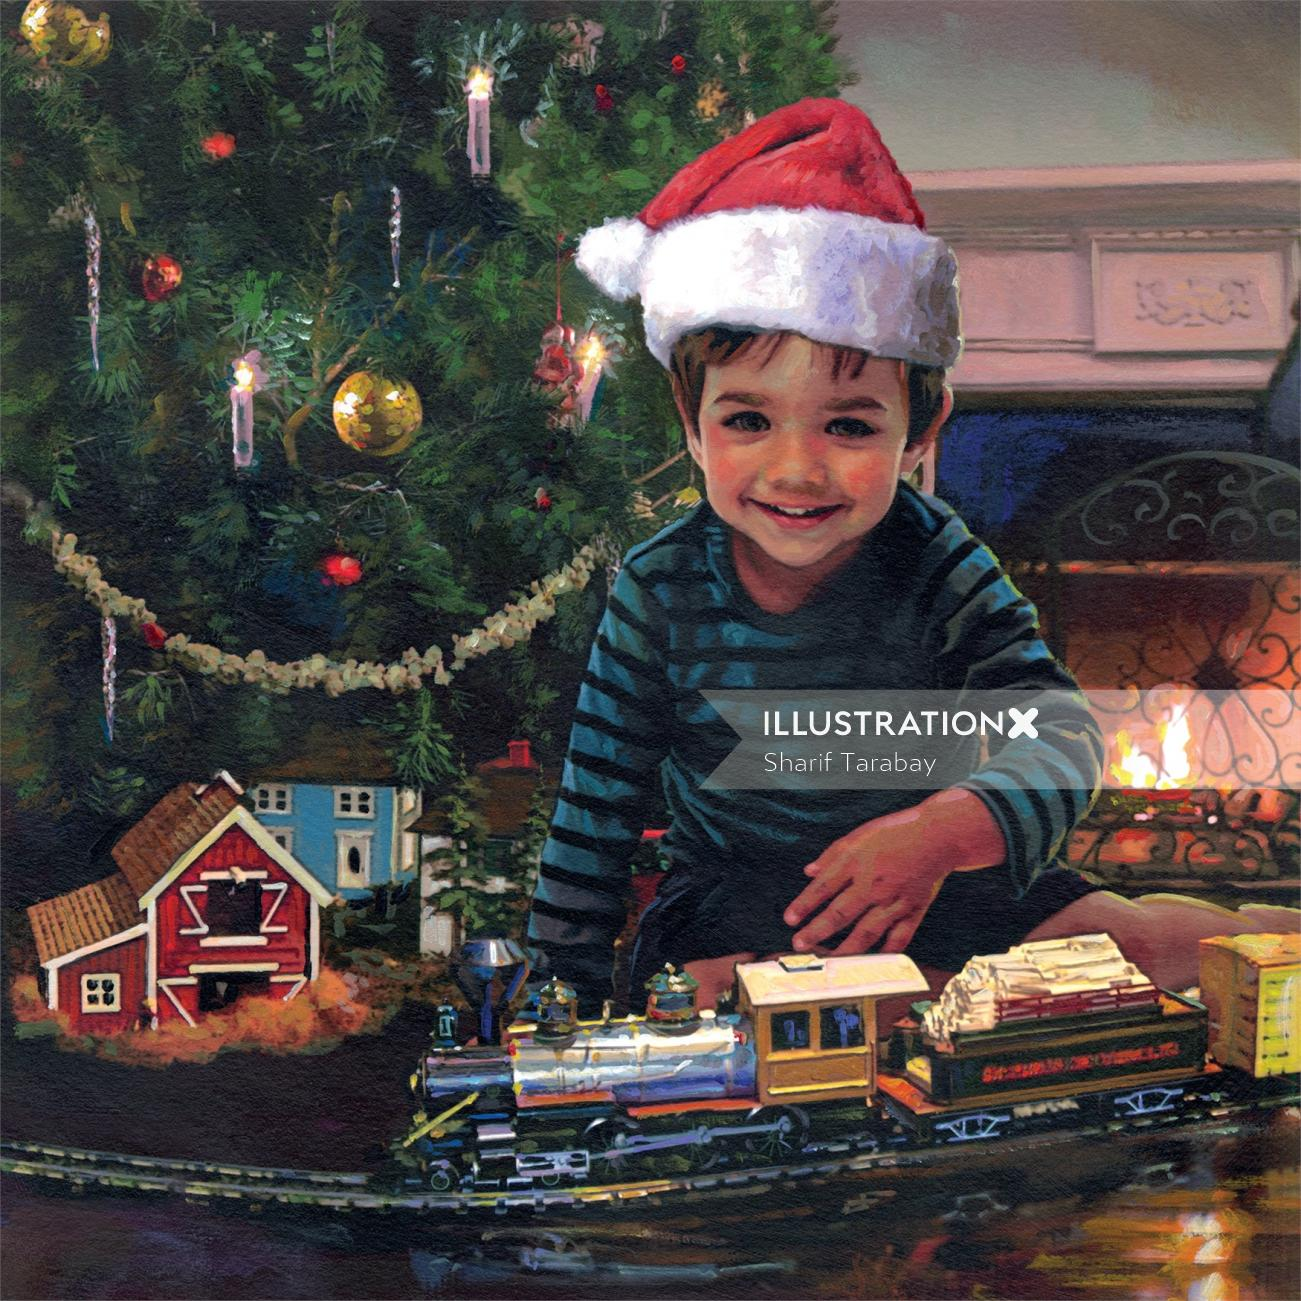 Portrait illustration of small boy